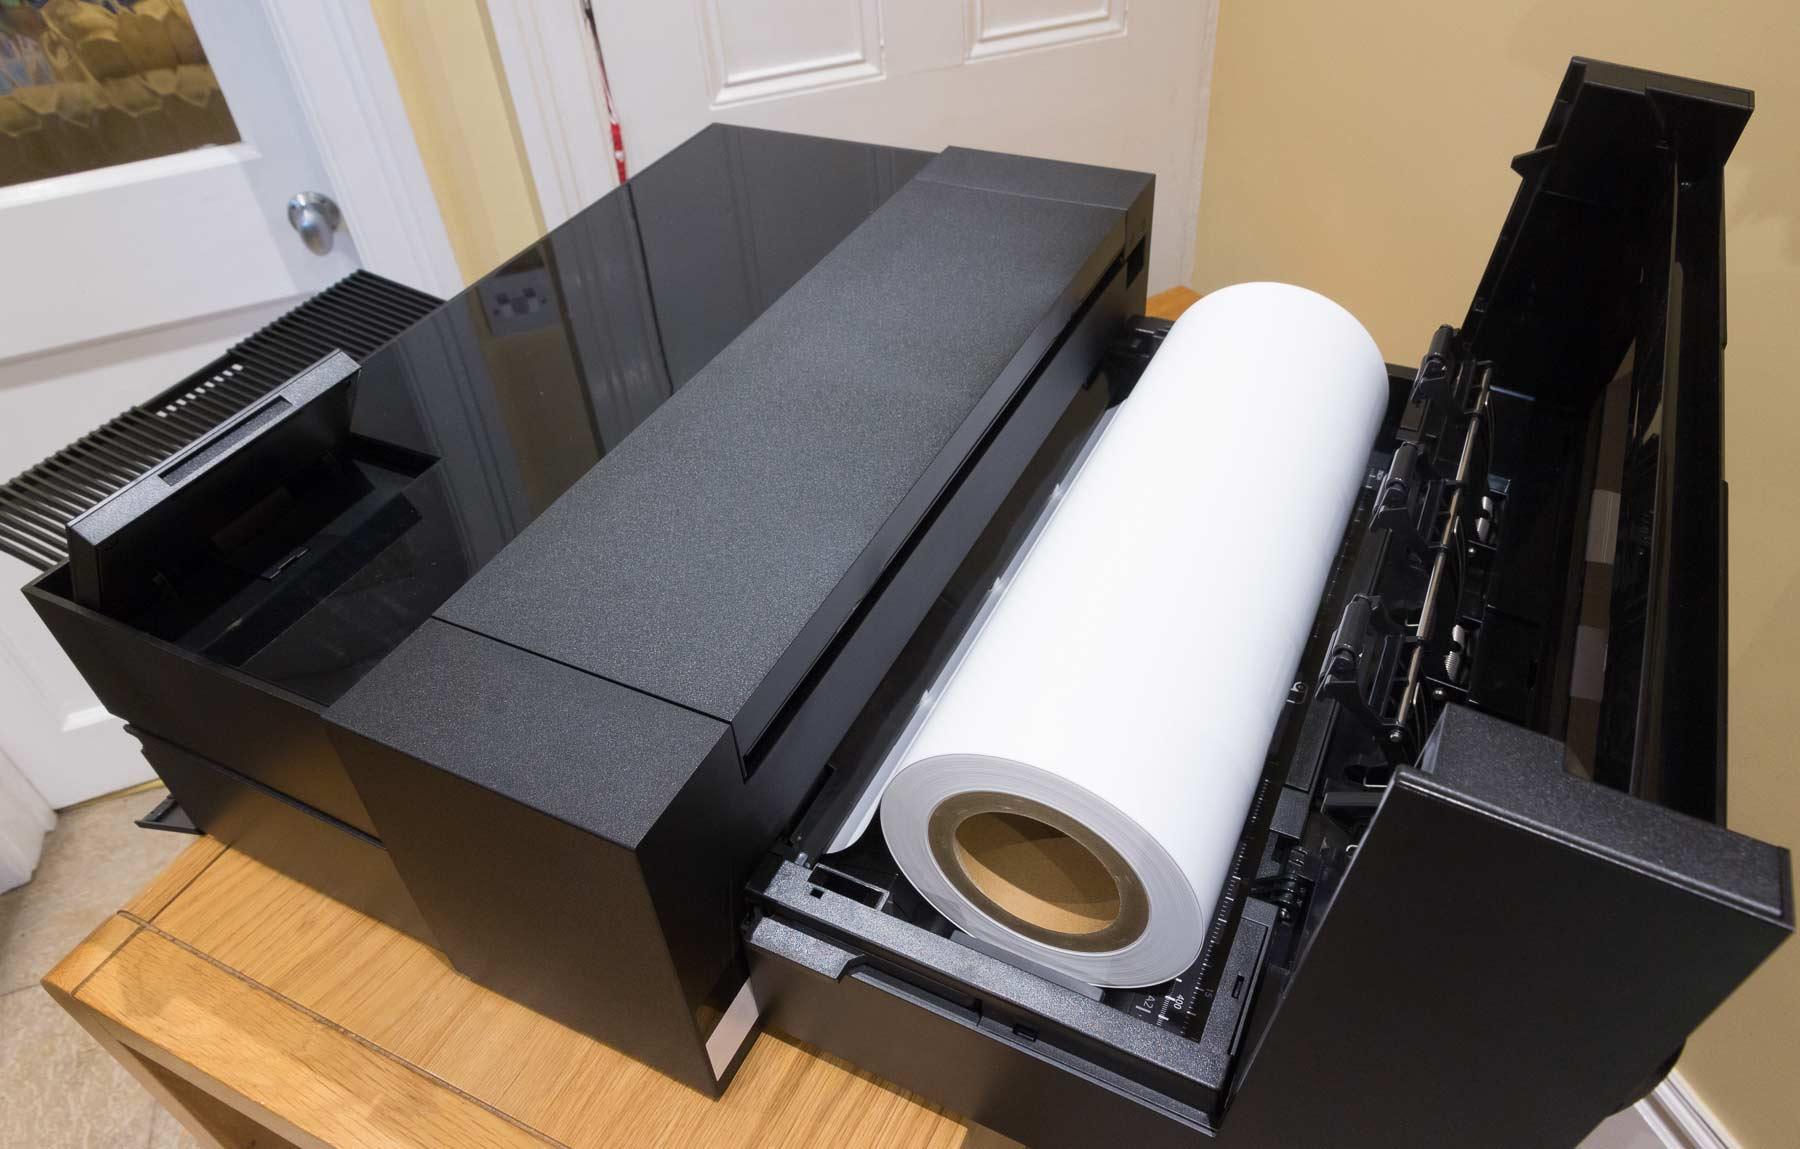 load-paper-until-sound